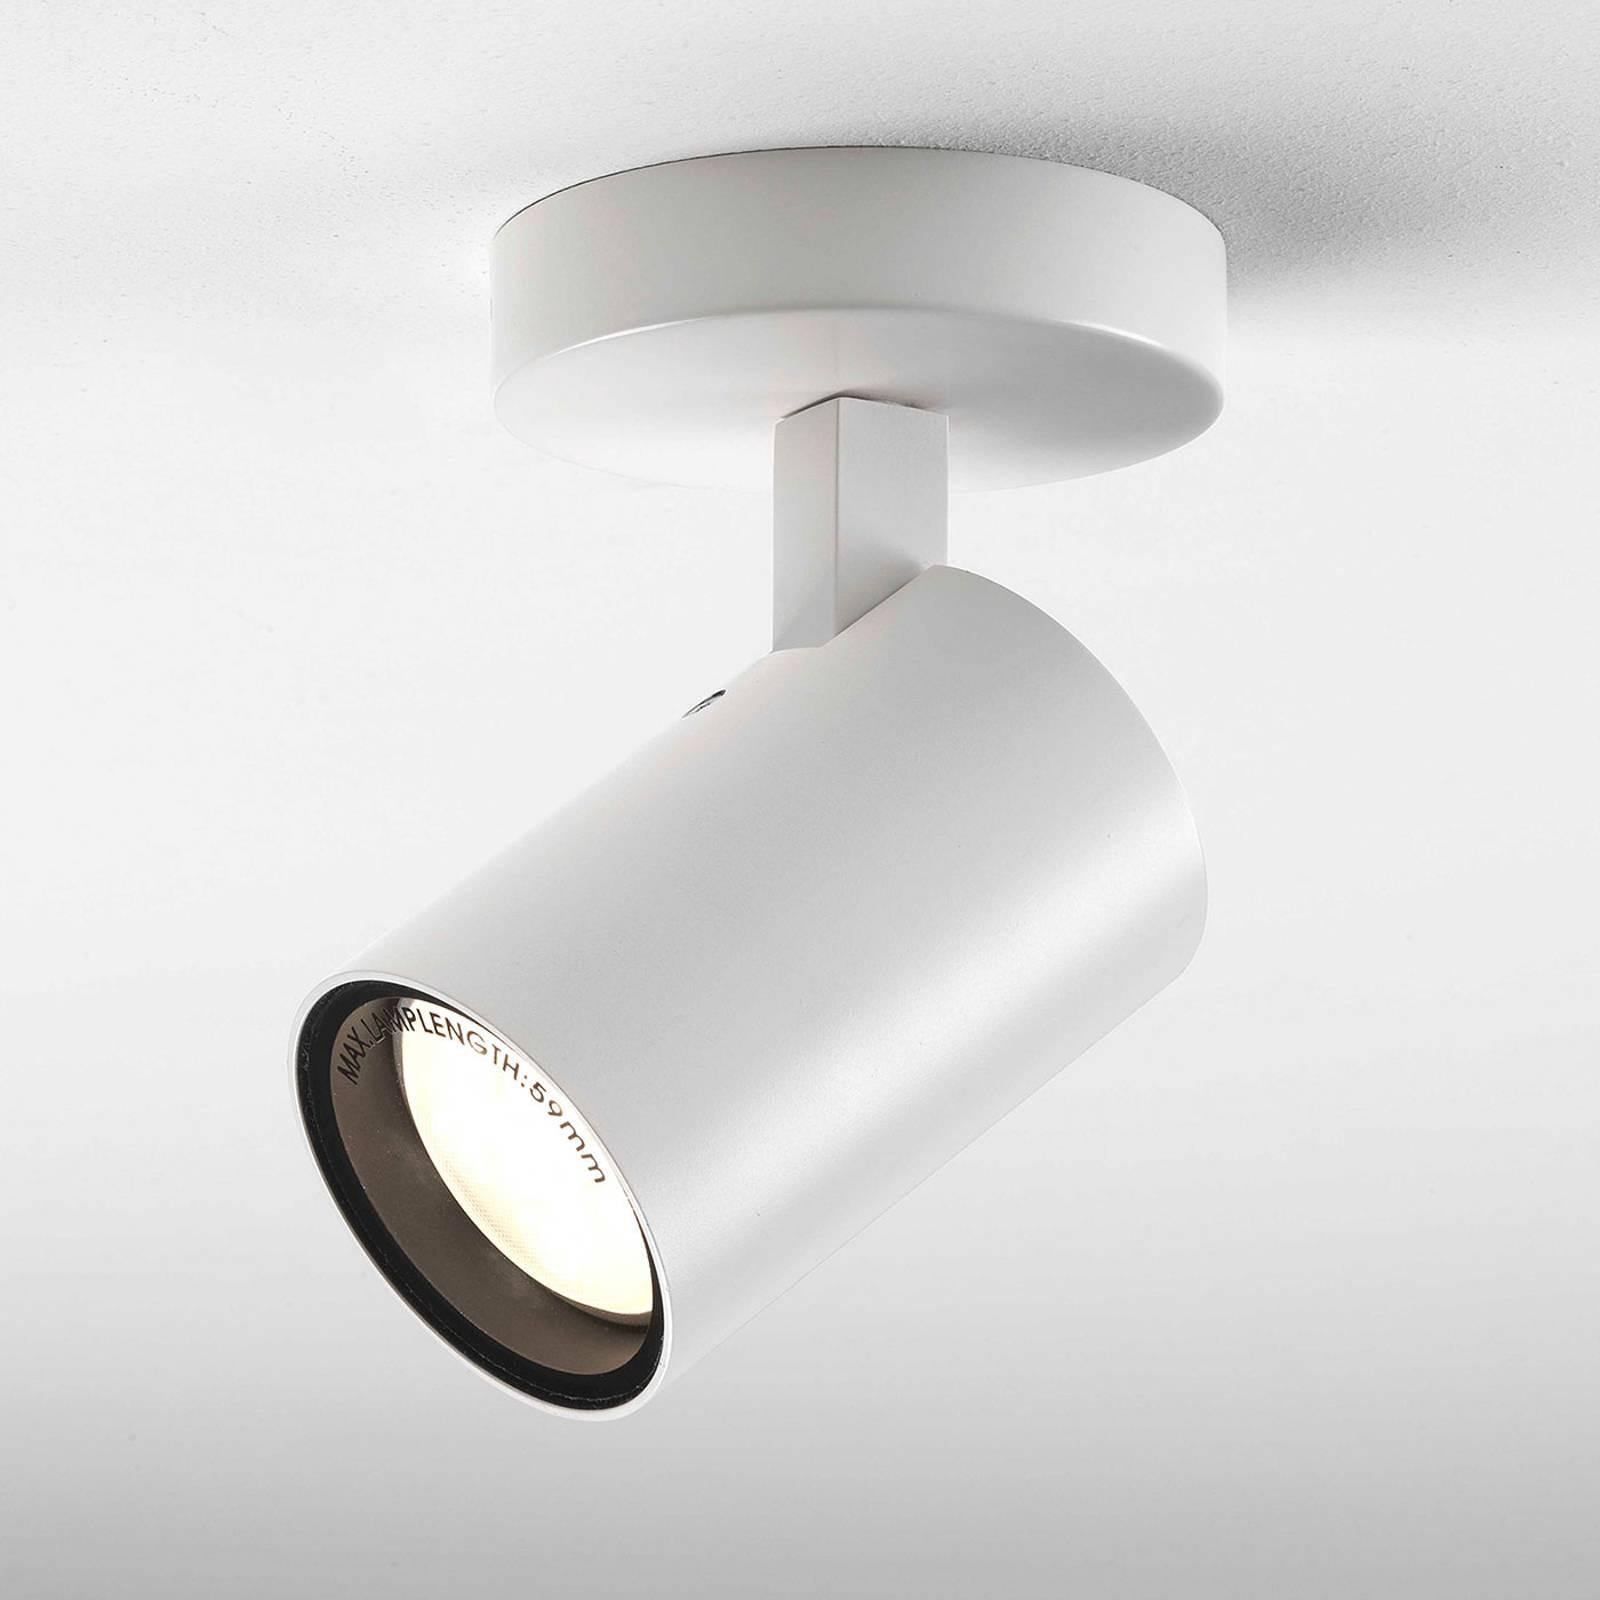 Astro Aqua Single LED badkamer plafondlamp wit